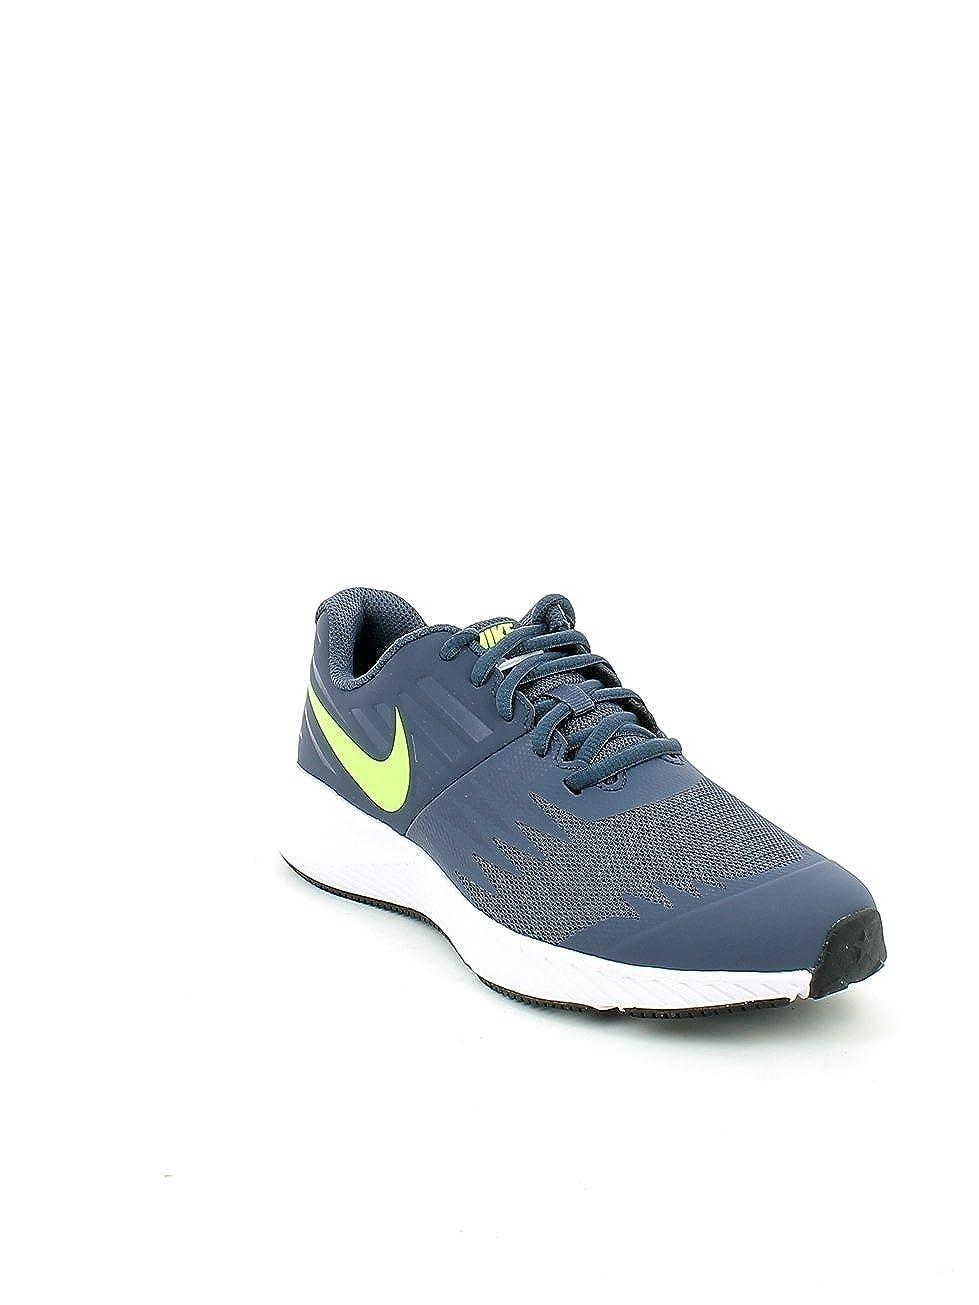 GS NIKE Star Runner Zapatillas de Running para Ni/ños